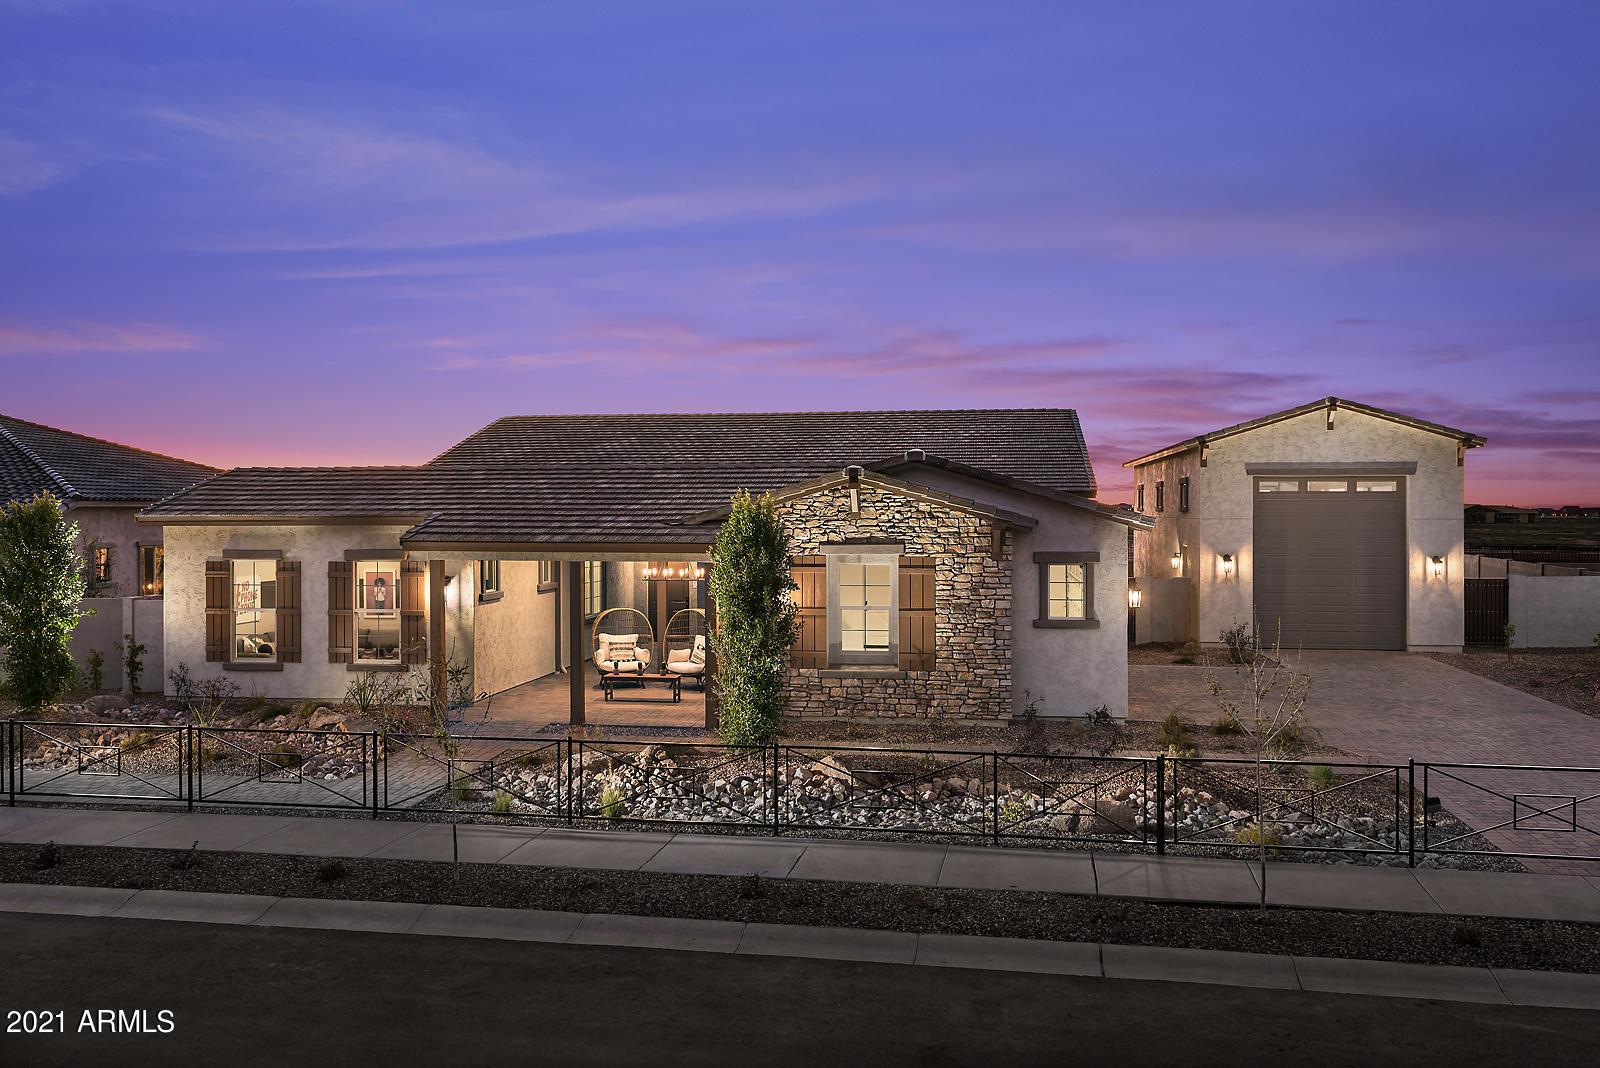 21470 228TH Place, Queen Creek, Arizona 85142, 4 Bedrooms Bedrooms, ,3.5 BathroomsBathrooms,Residential,For Sale,228TH,6255542